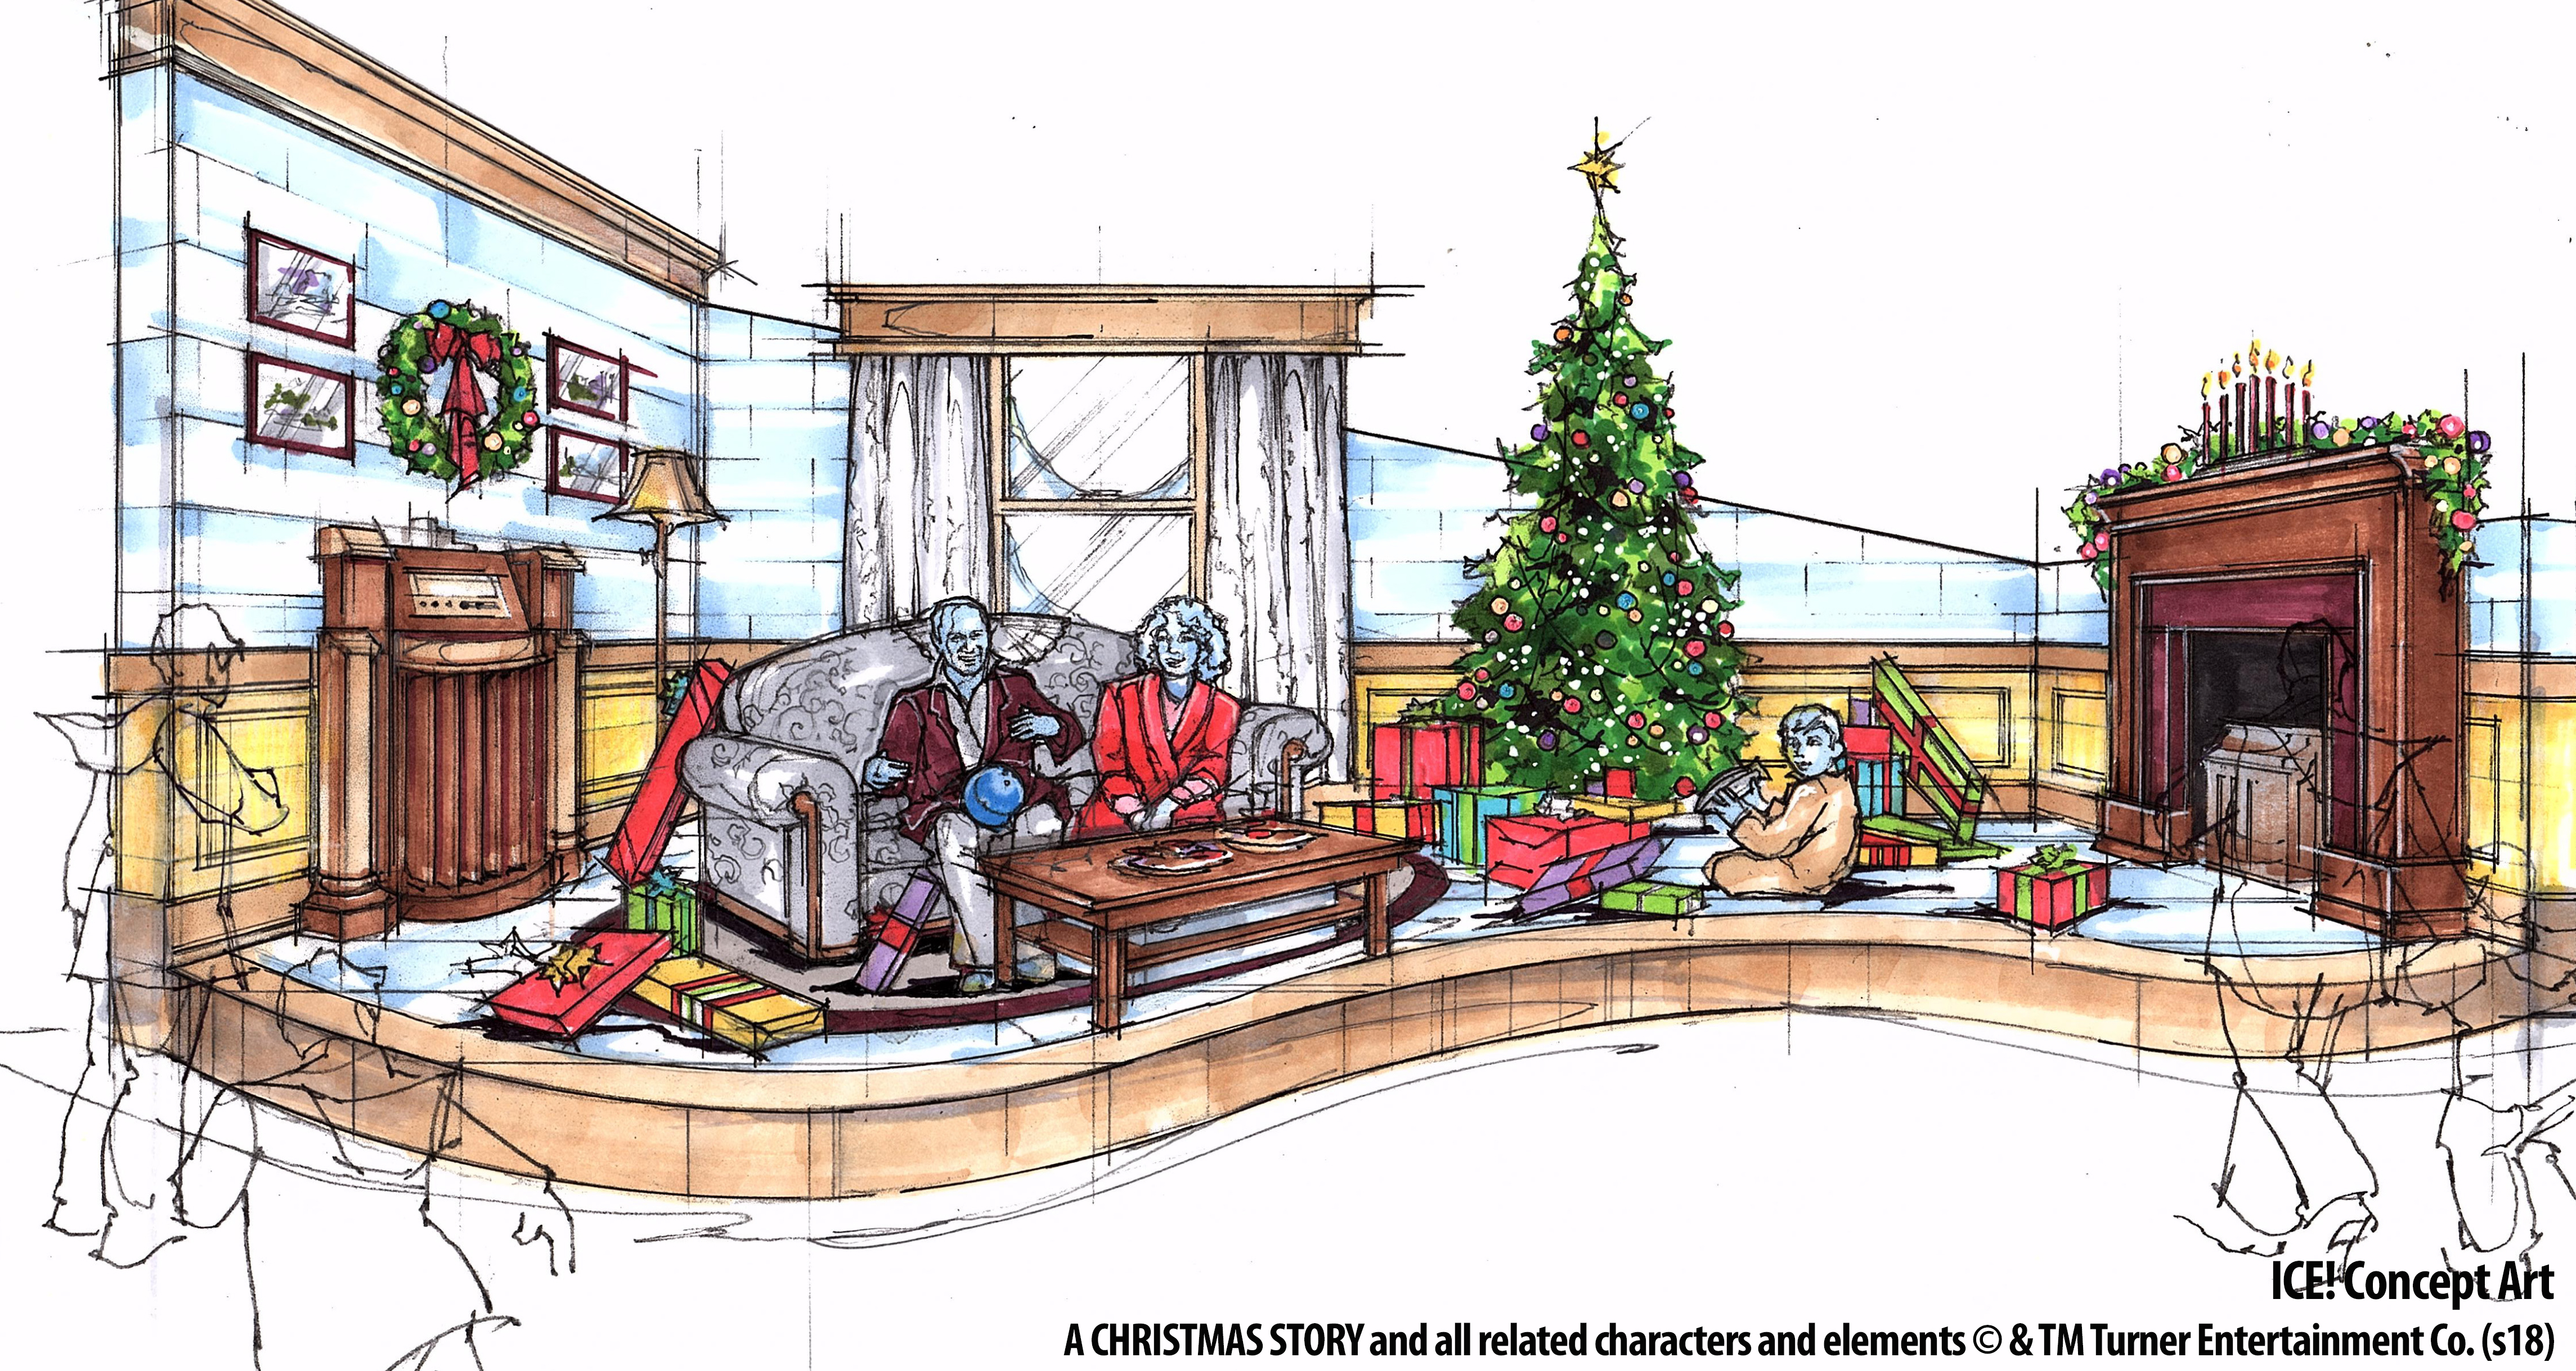 Christmas at Gaylord Palms 2018, Christmas Gaylord Palms, Gaylord Palms Orlando